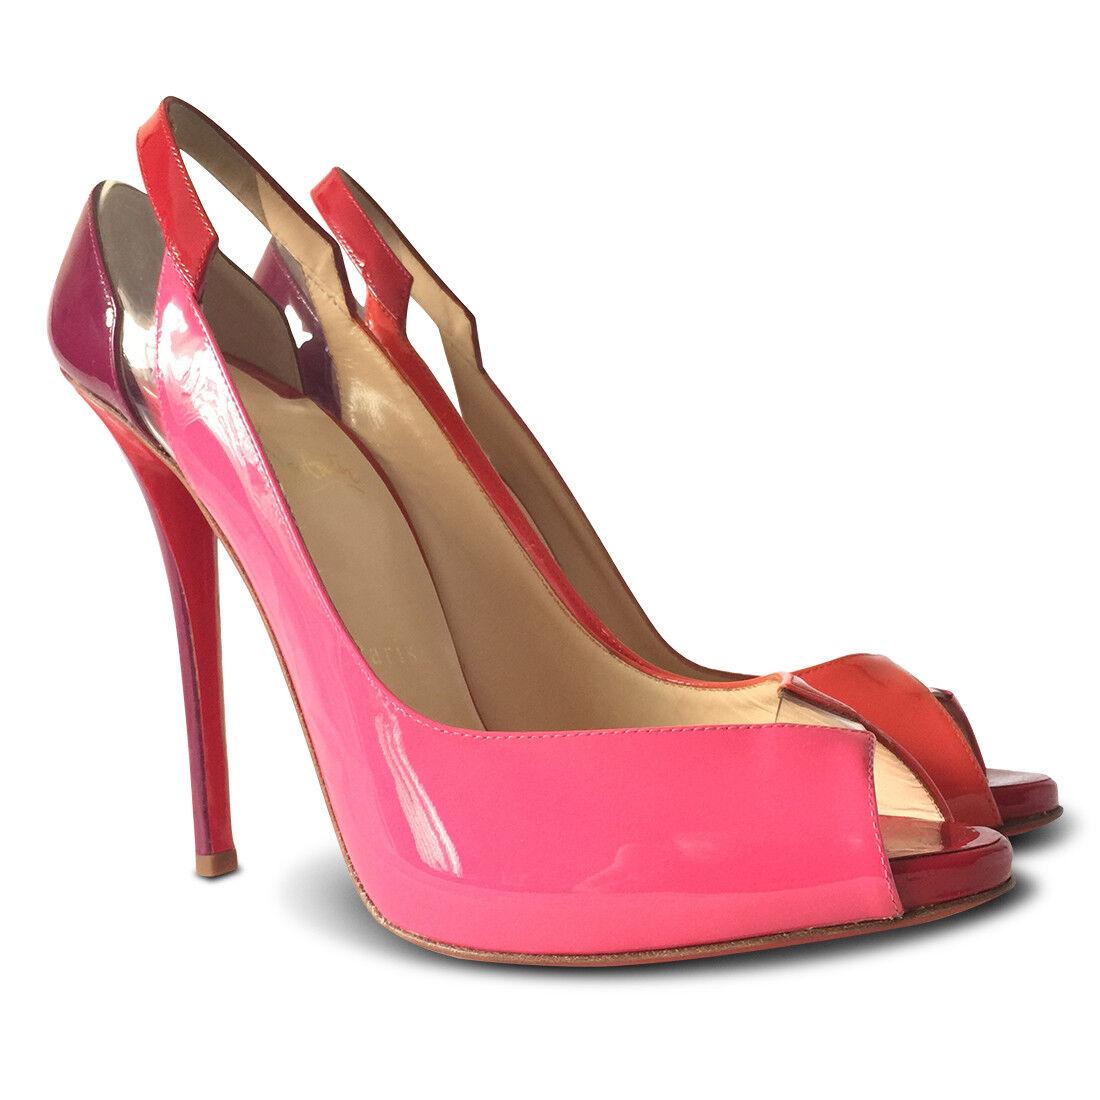 NEW  1172 LOUBOUTIN Technicatina 120 Patent Pumps - Red, Pink, orange, Size 40.5